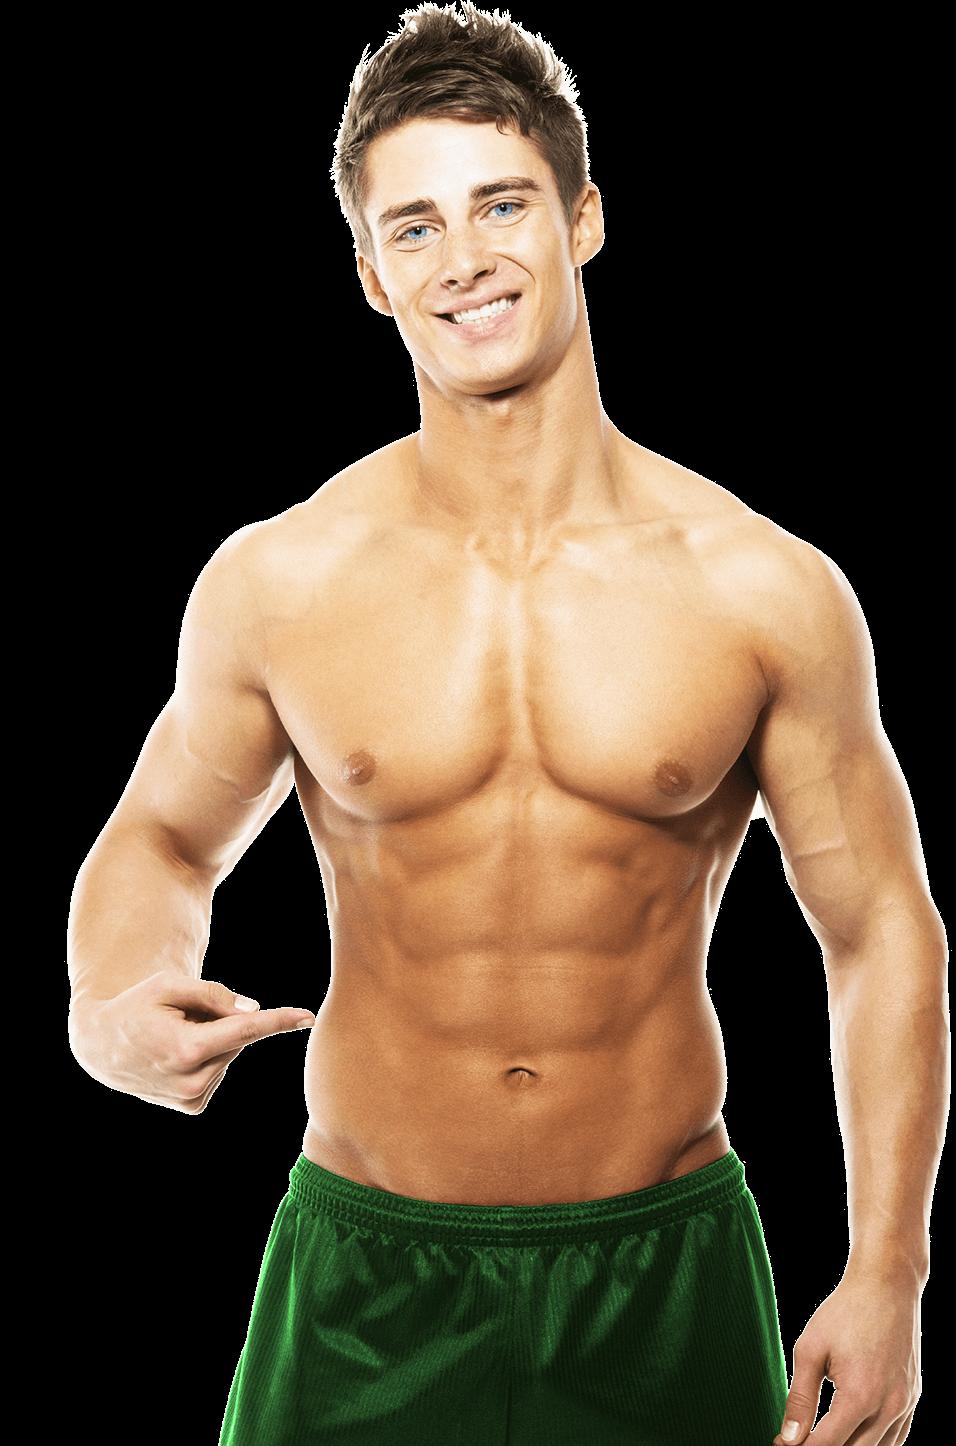 Men body png 5 » PNG Image.